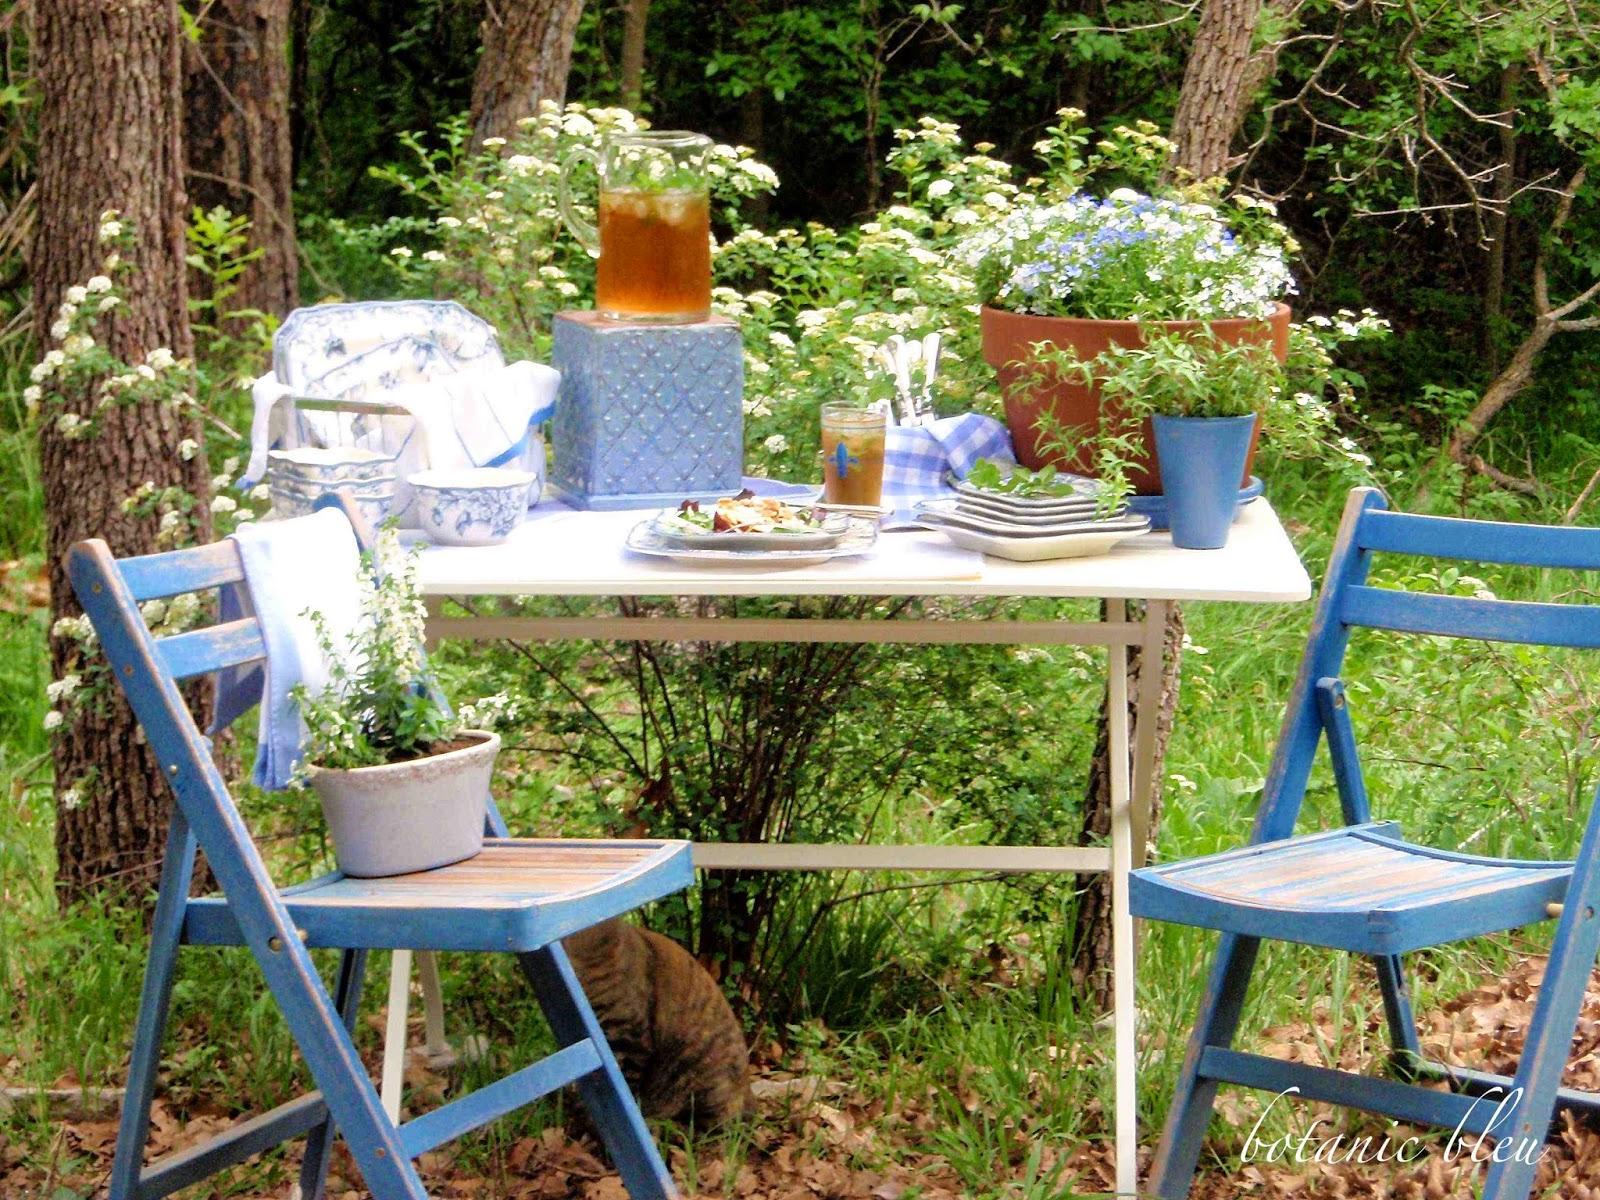 Botanic Bleu Spirea Garden Party French Style